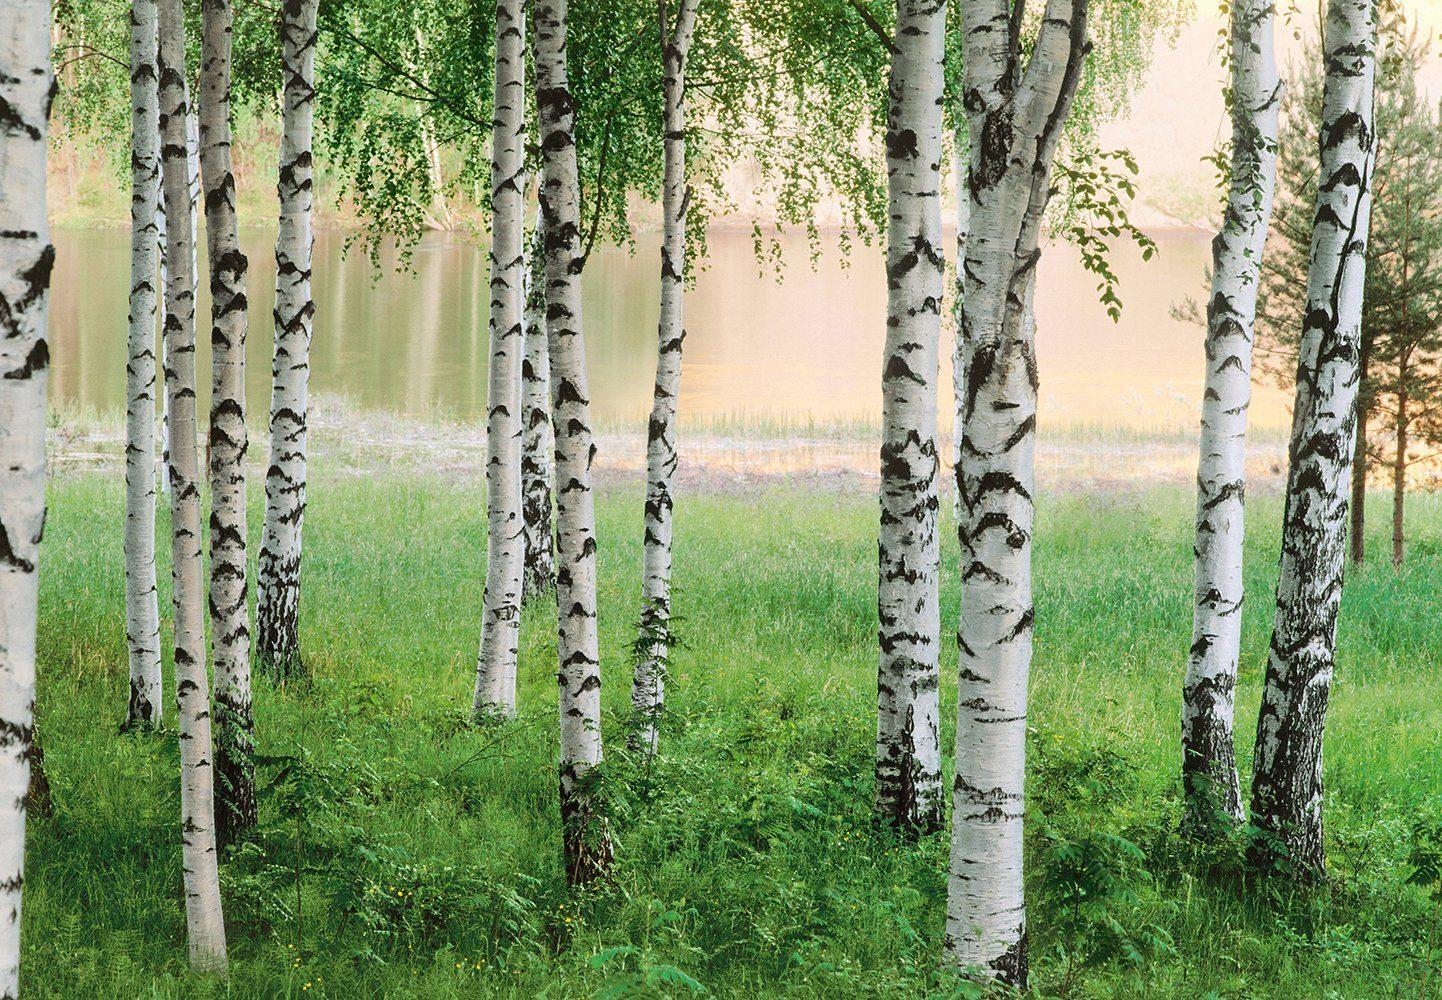 Fototapete »Nordic Forest«, 8-teilig, 366x254 cm